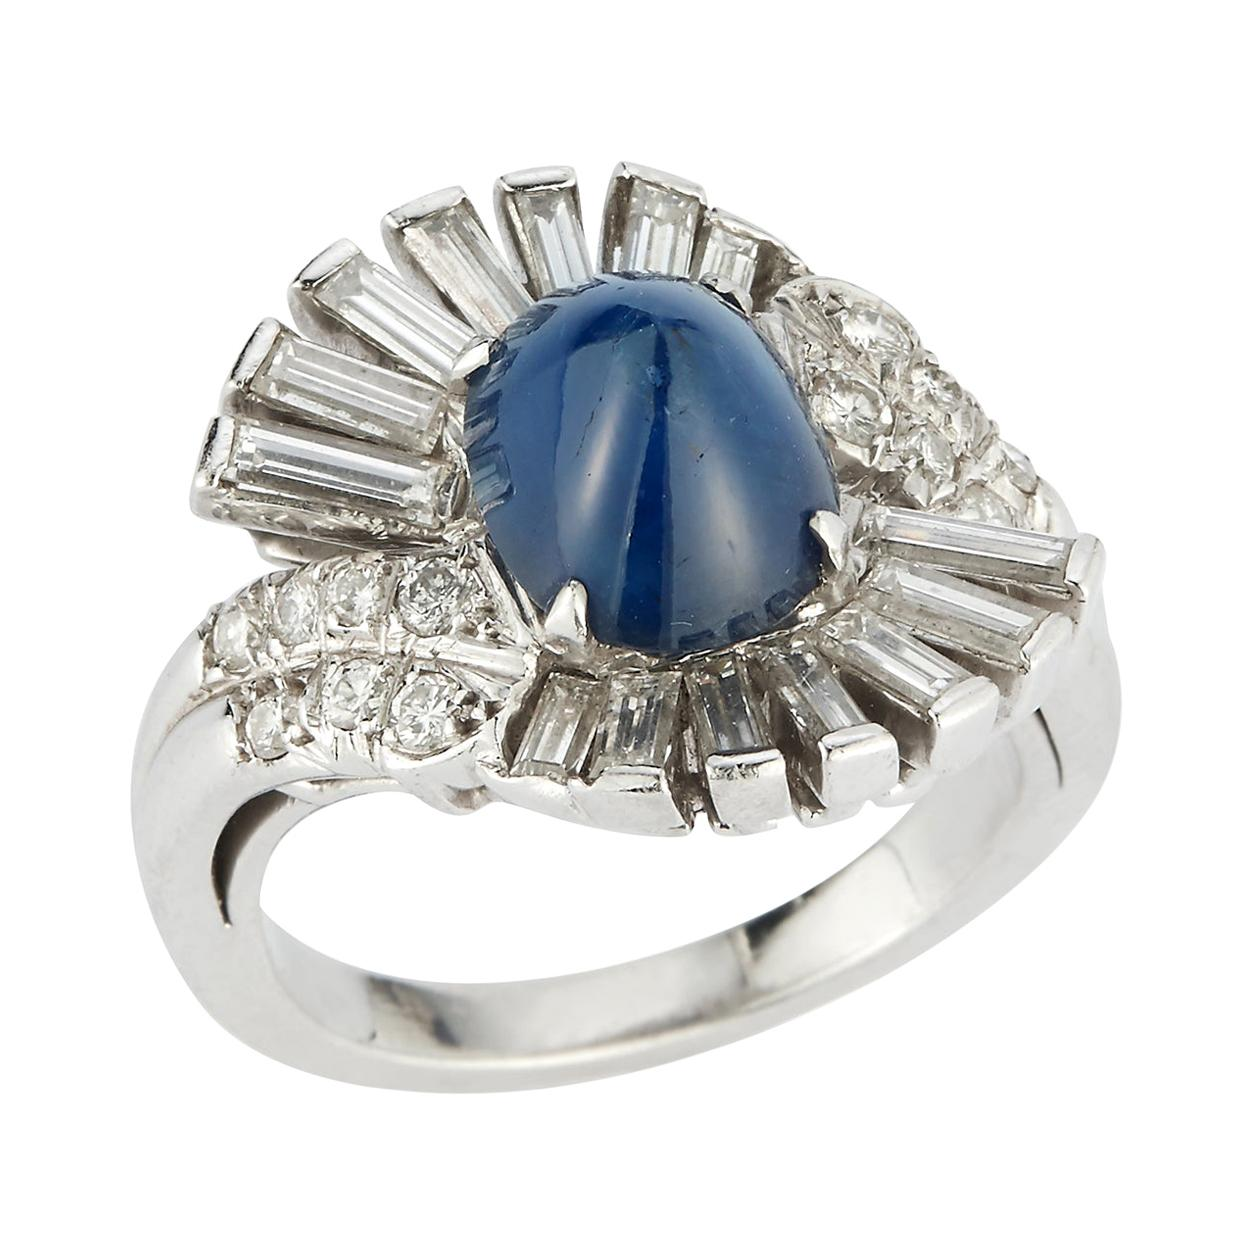 Art Deco Style Cabochon Sapphire & Diamond Cocktail Ring